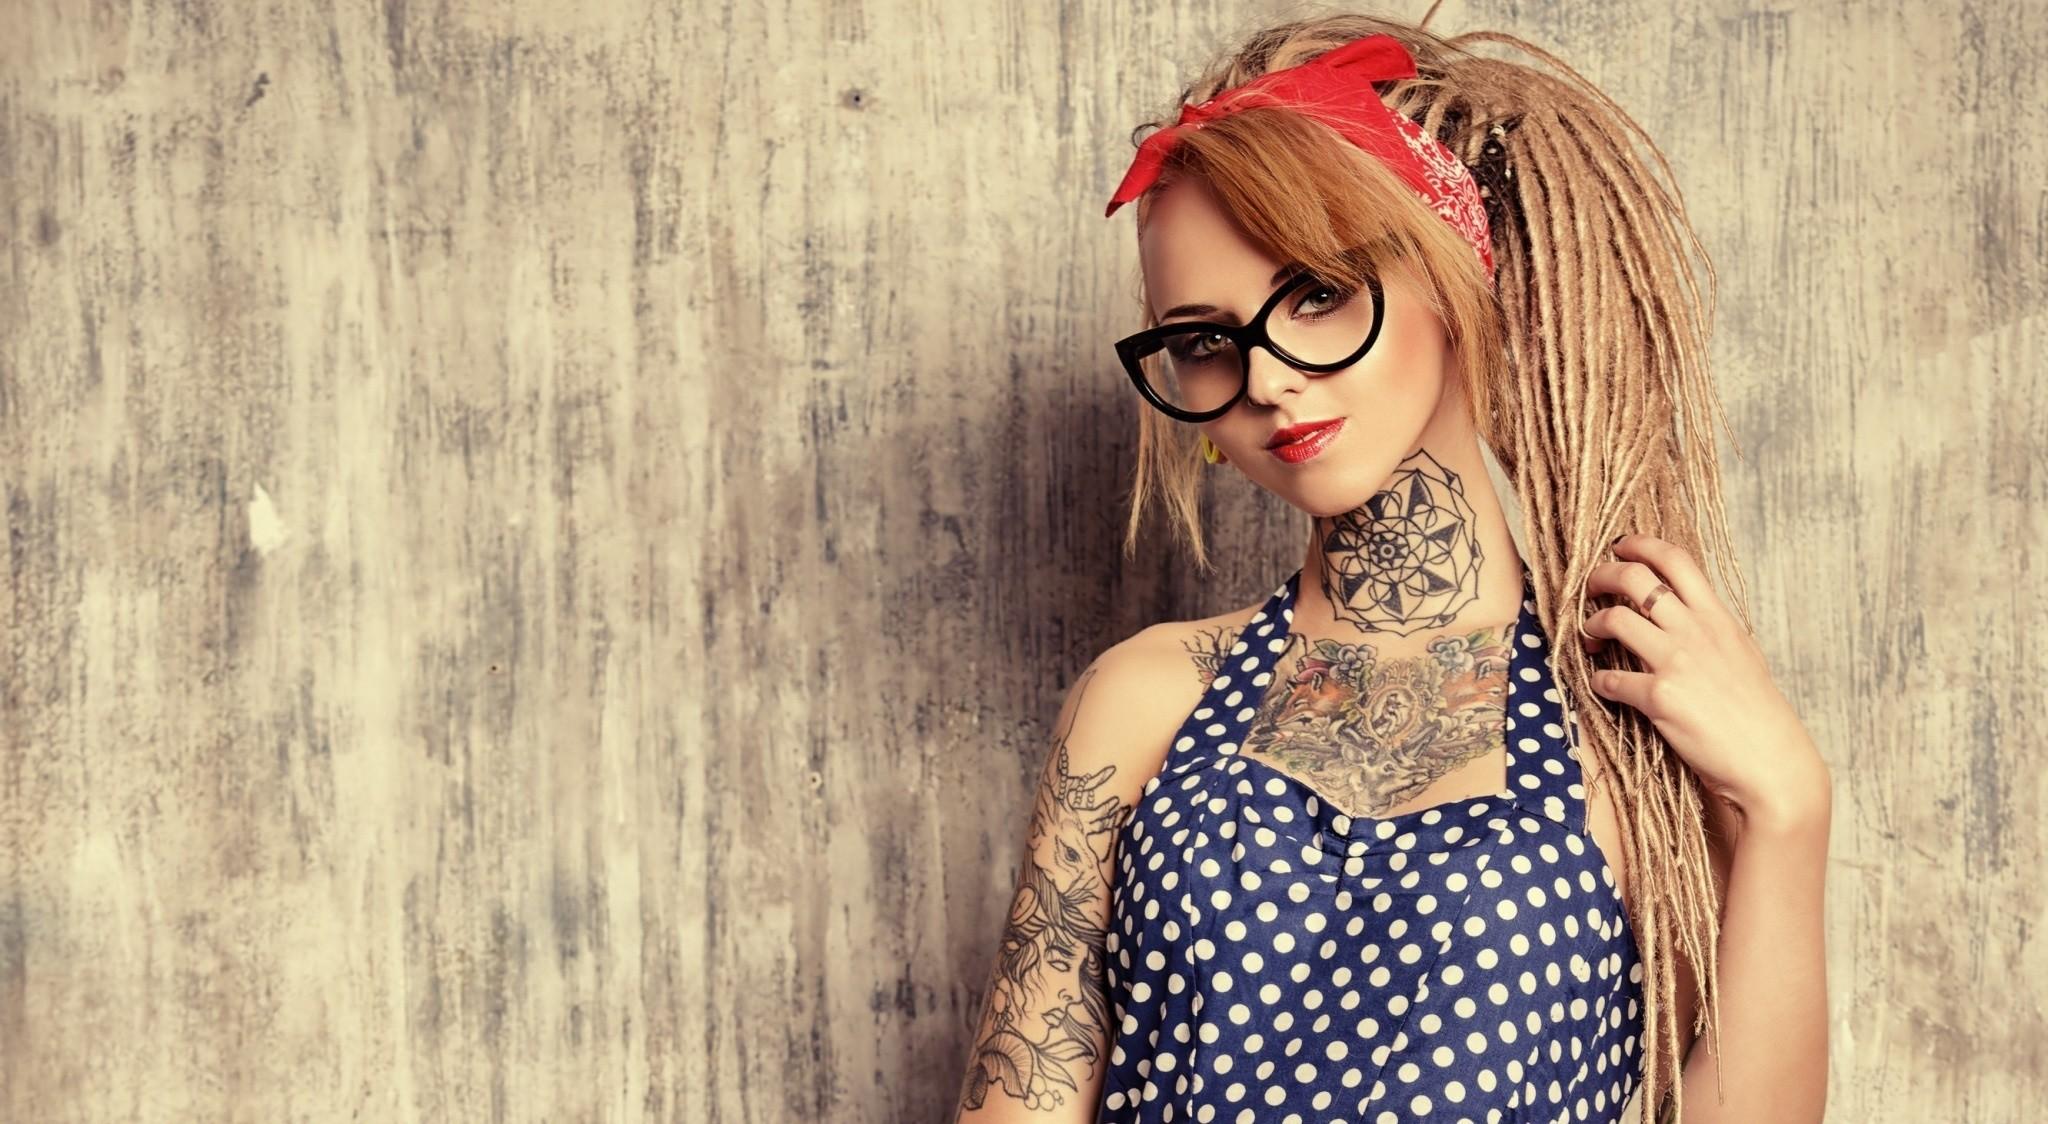 Tattoo Women Dreadlocks Women With Glasses 2048x1124